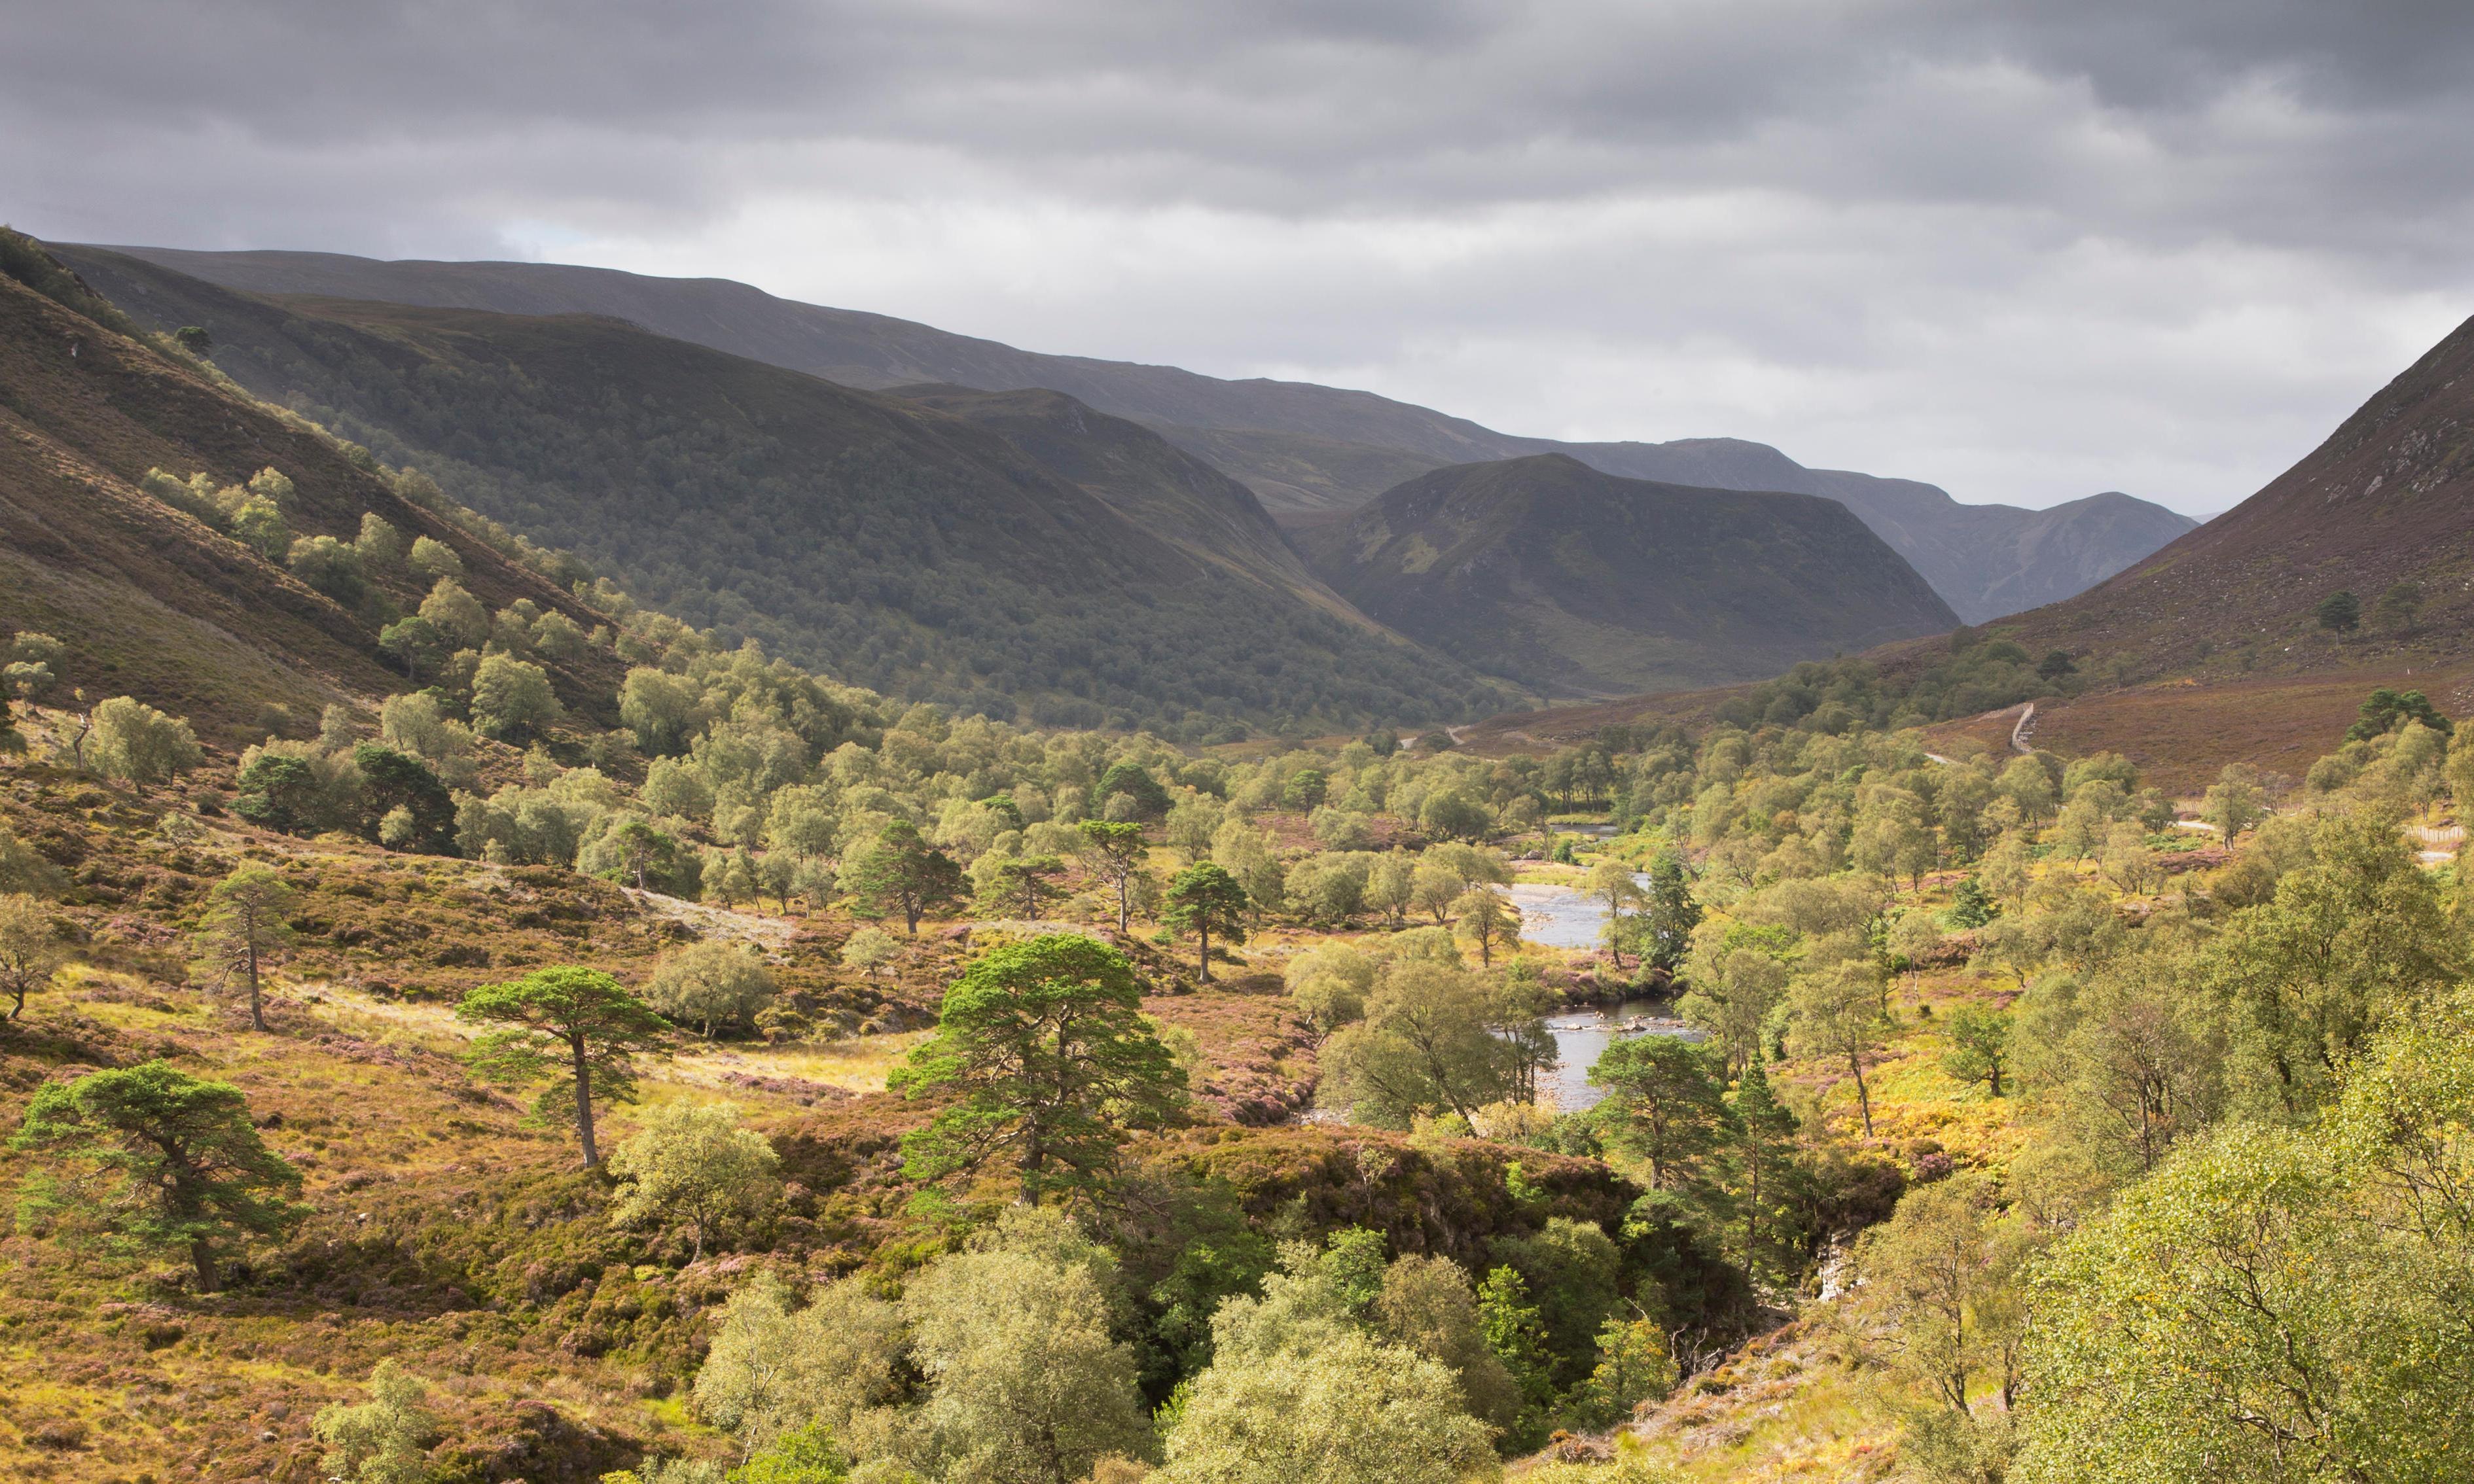 Rewild a quarter of UK to fight climate crisis, campaigners urge